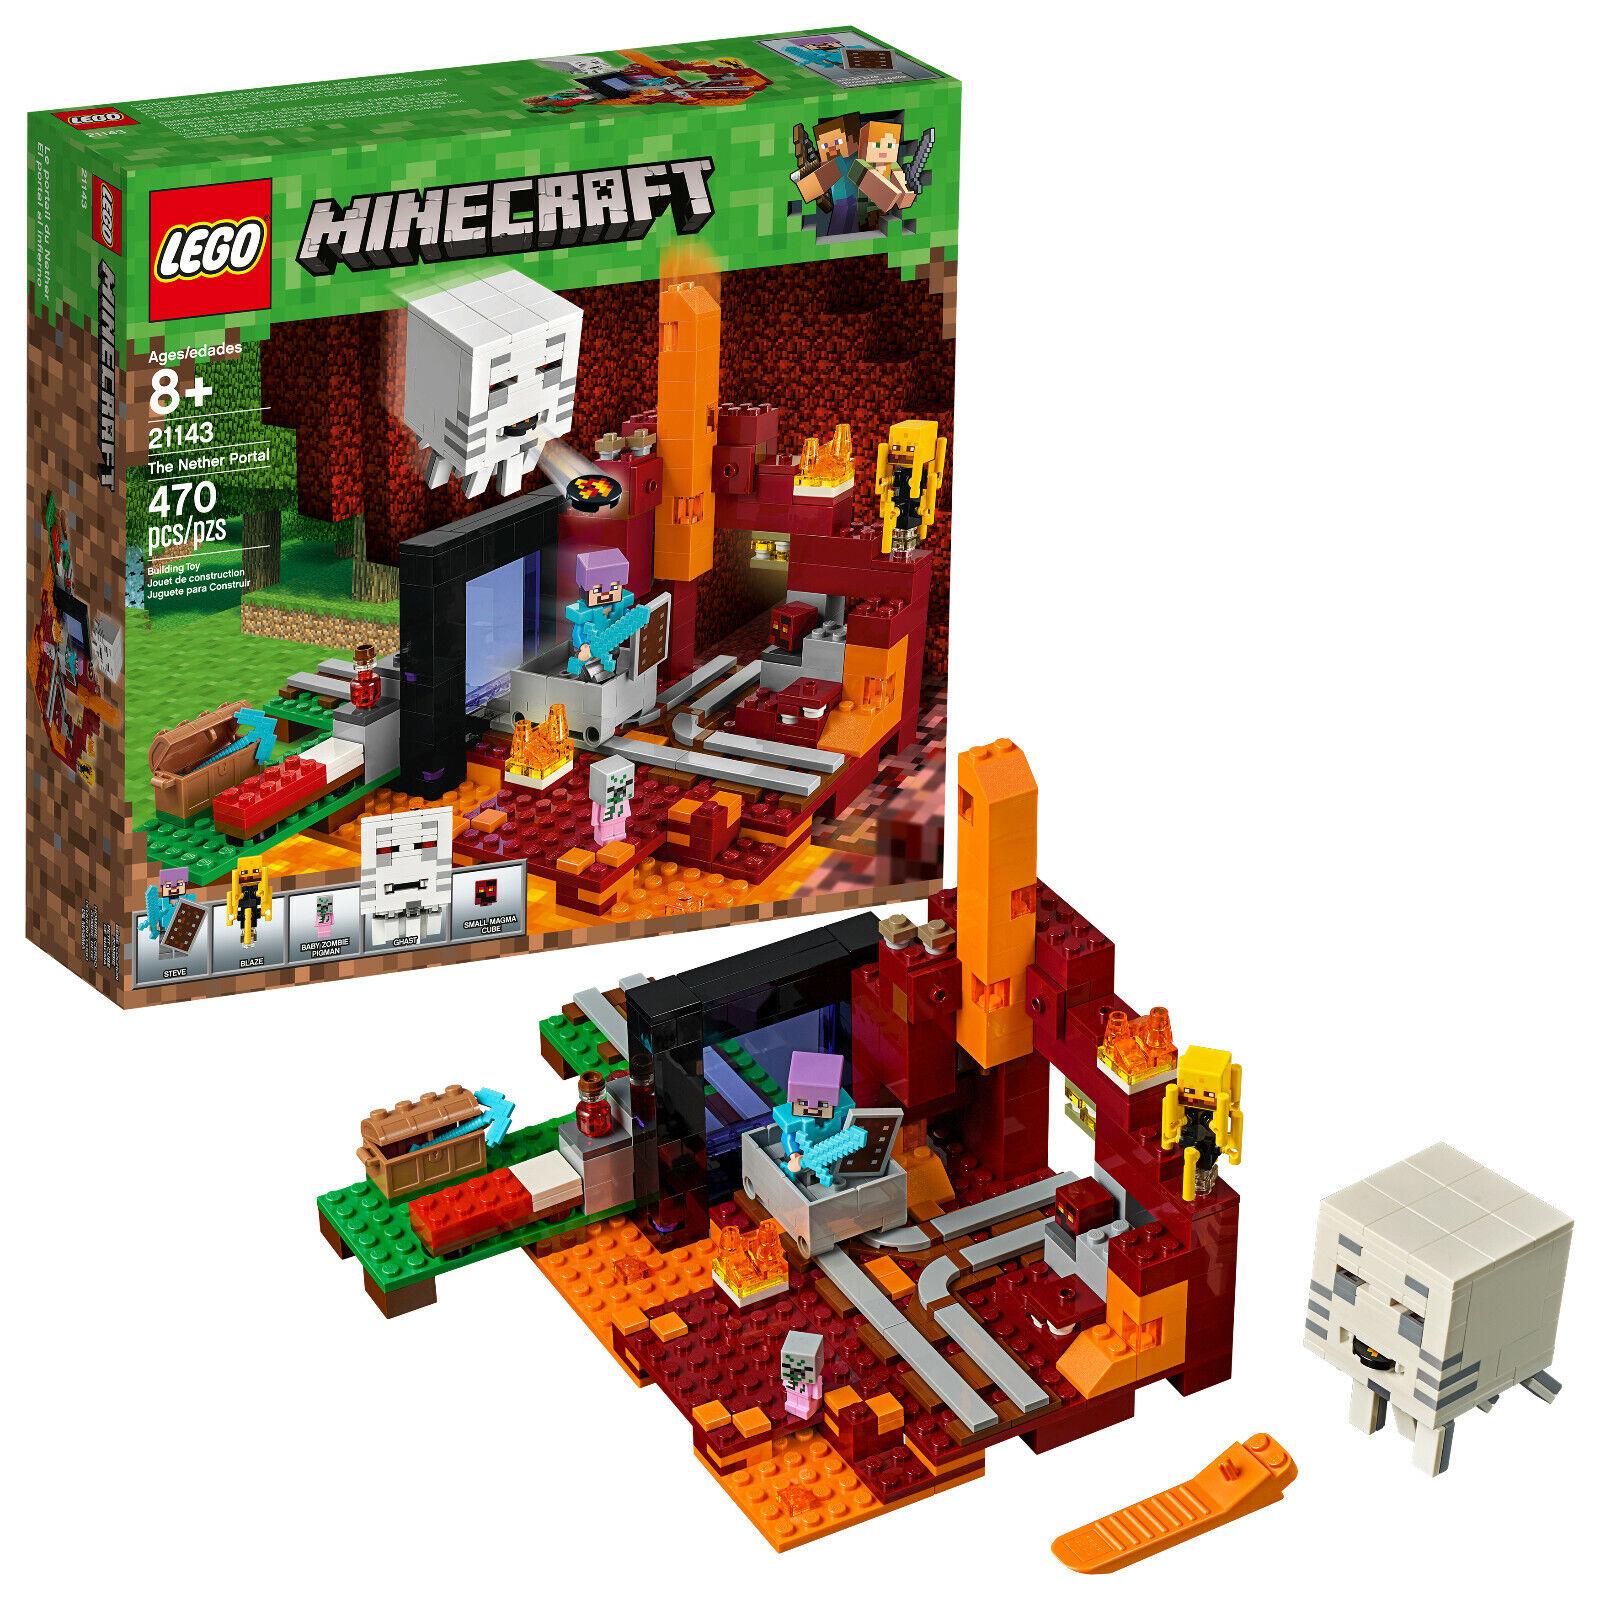 LEGO Minecraft Minecraft Minecraft The Nether Portal, 470 pieces (21143) 6284e9